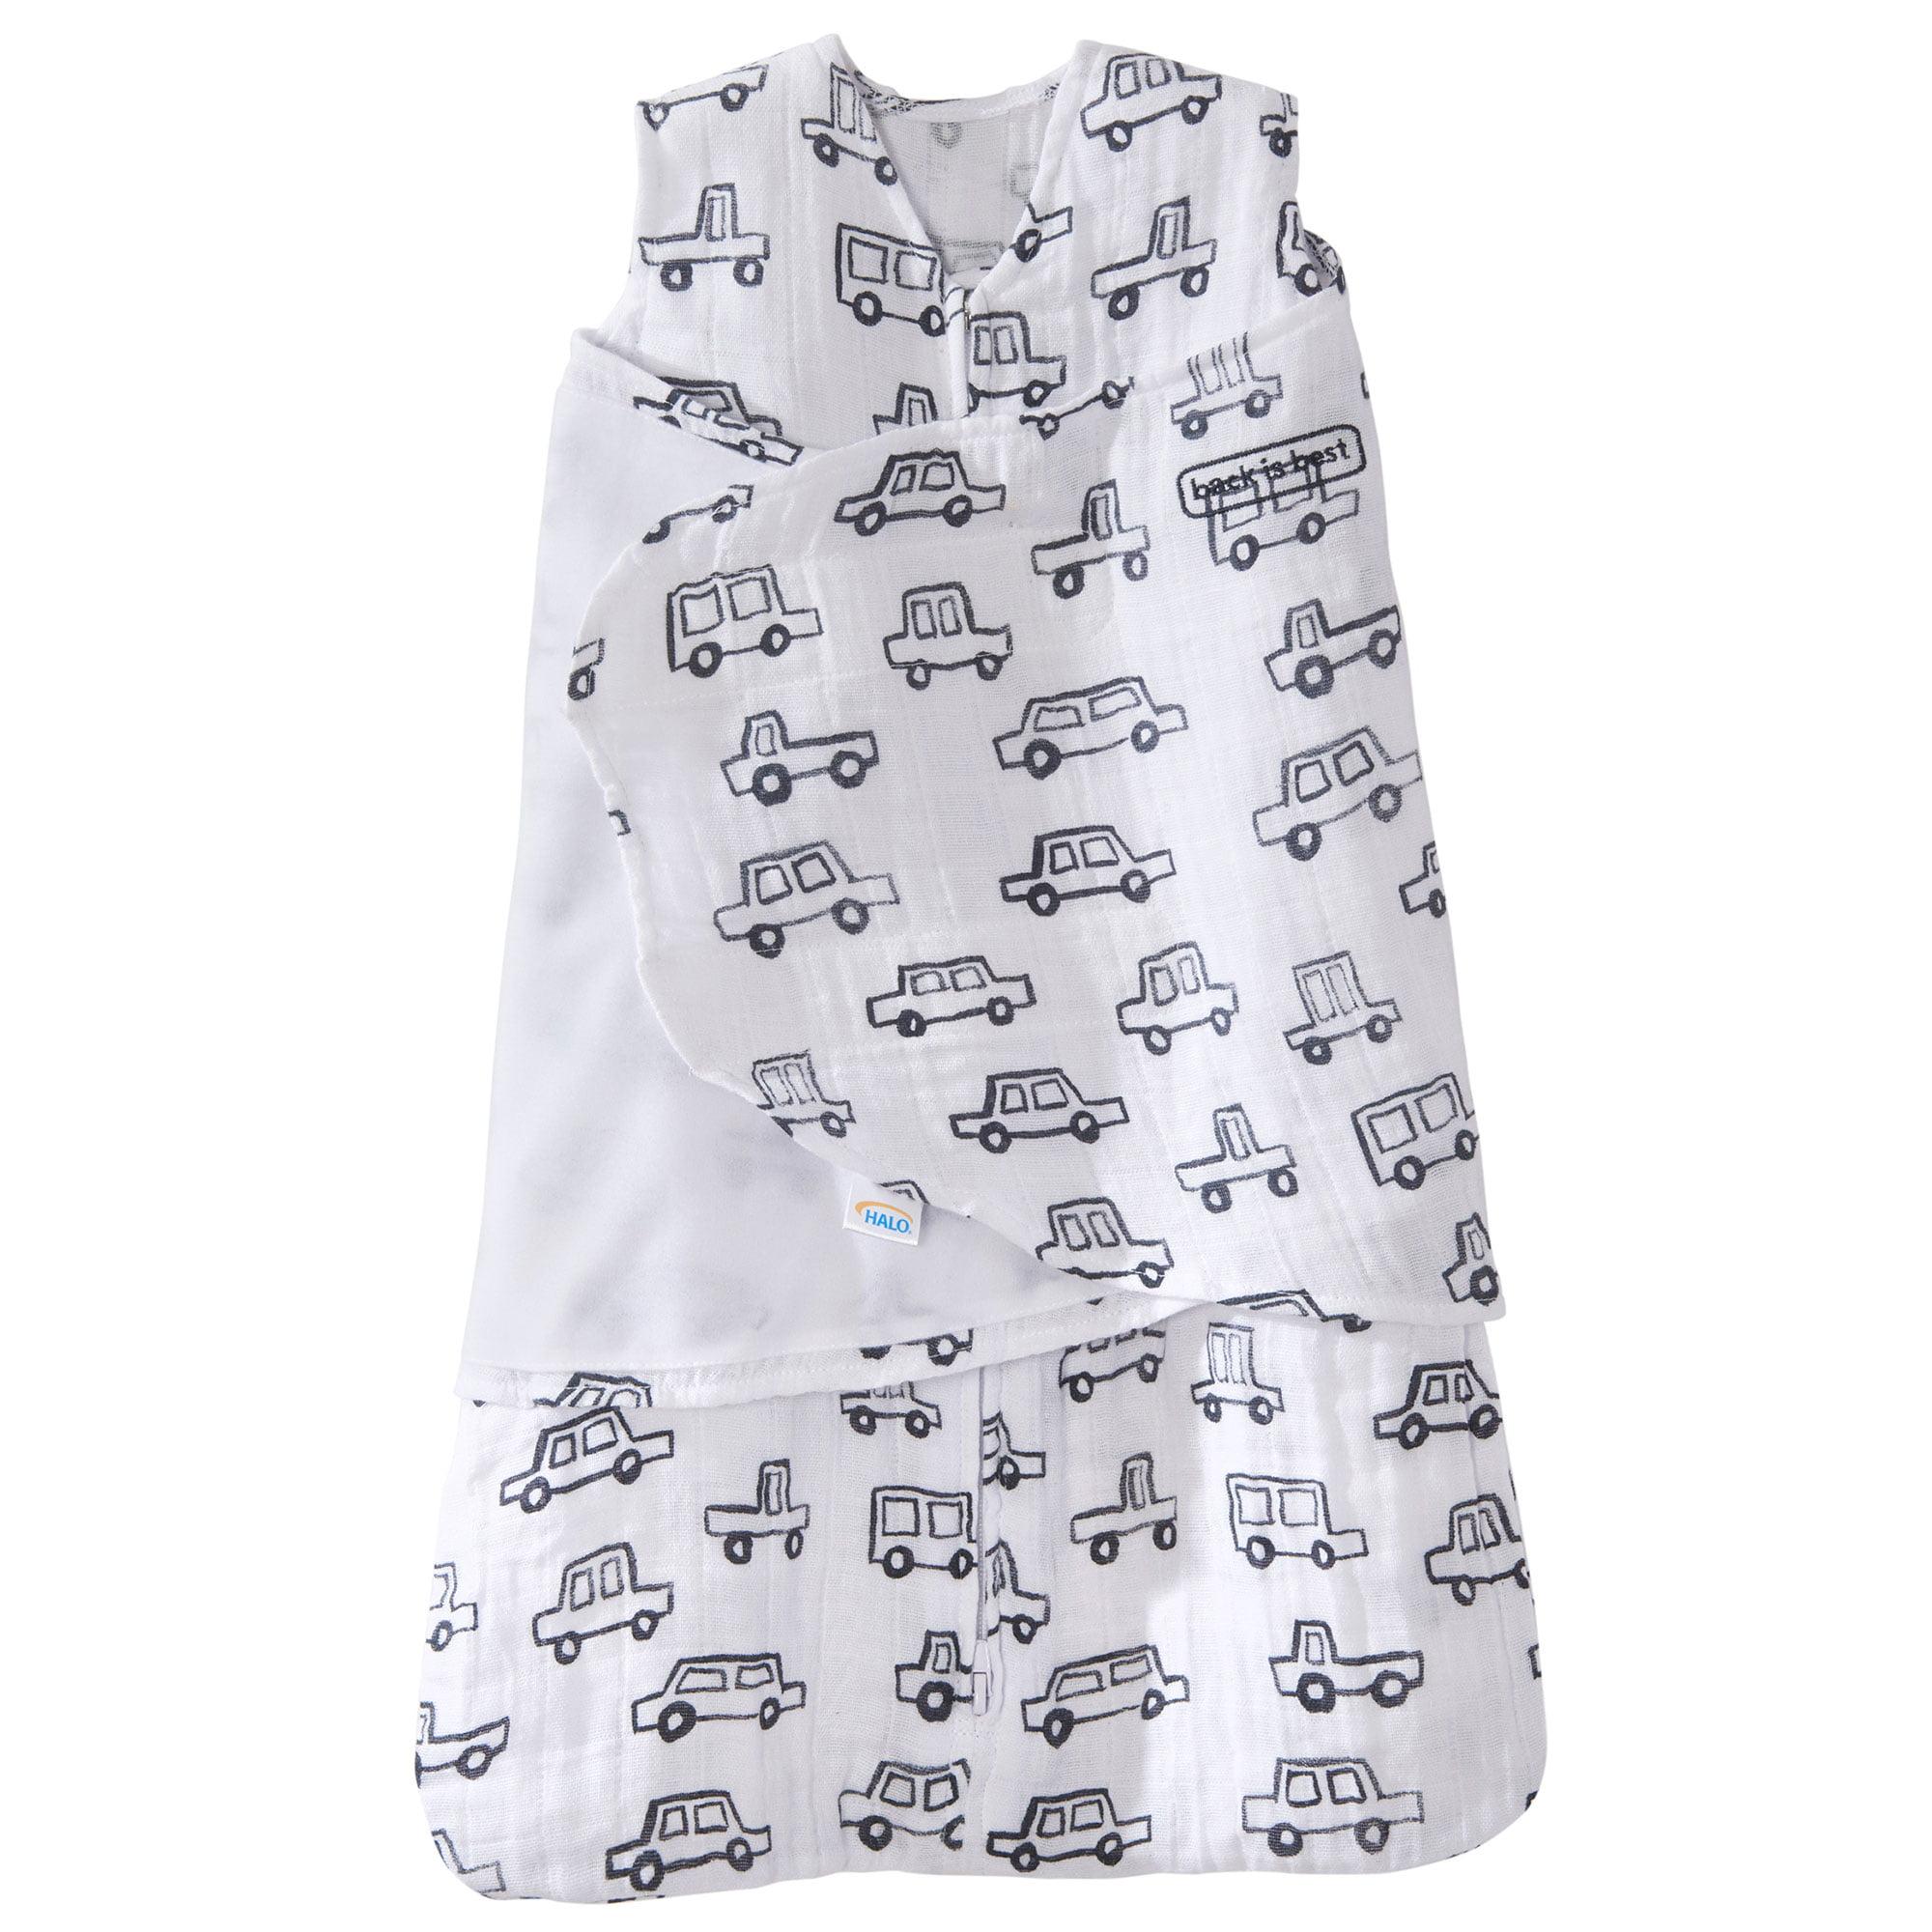 Llama Print Small Halo 100/% Cotton Muslin Sleepsack Swaddle Wearable Blanket